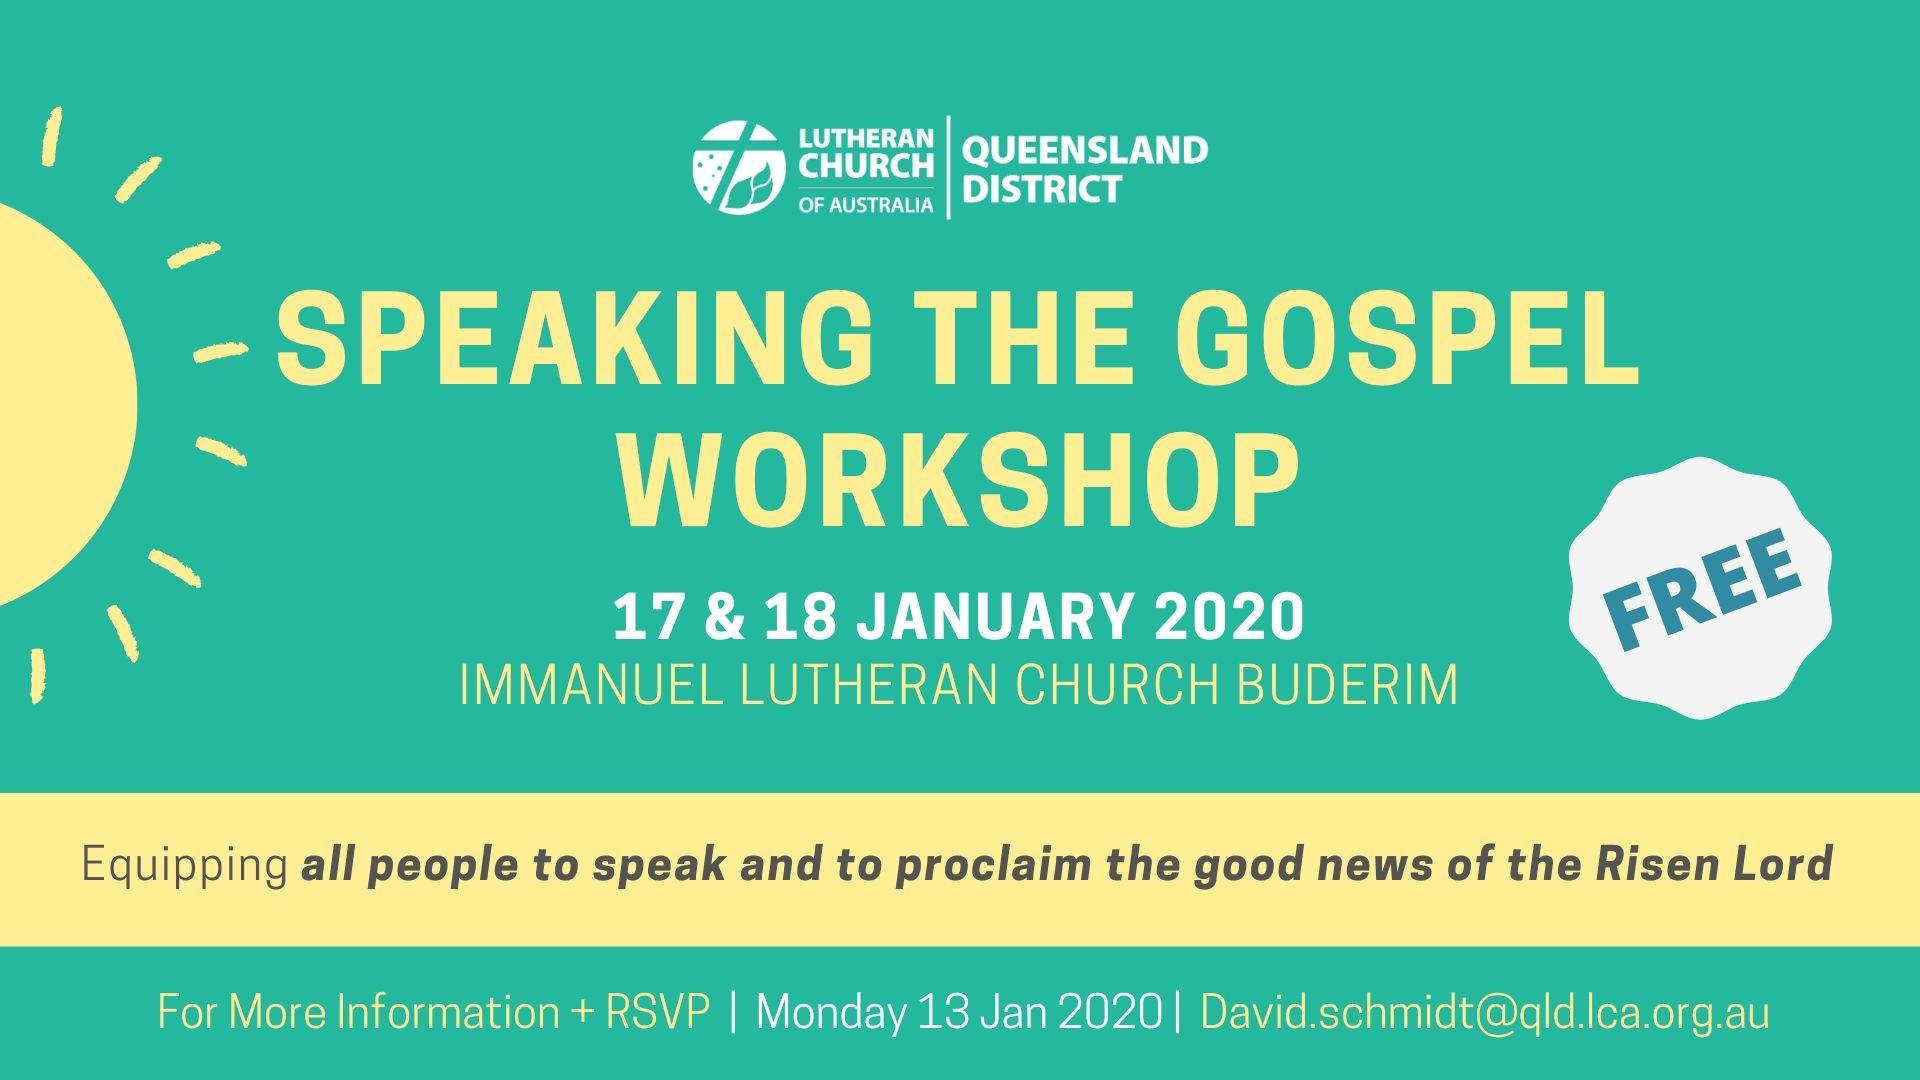 Speaking The Gospel Workshop 2020